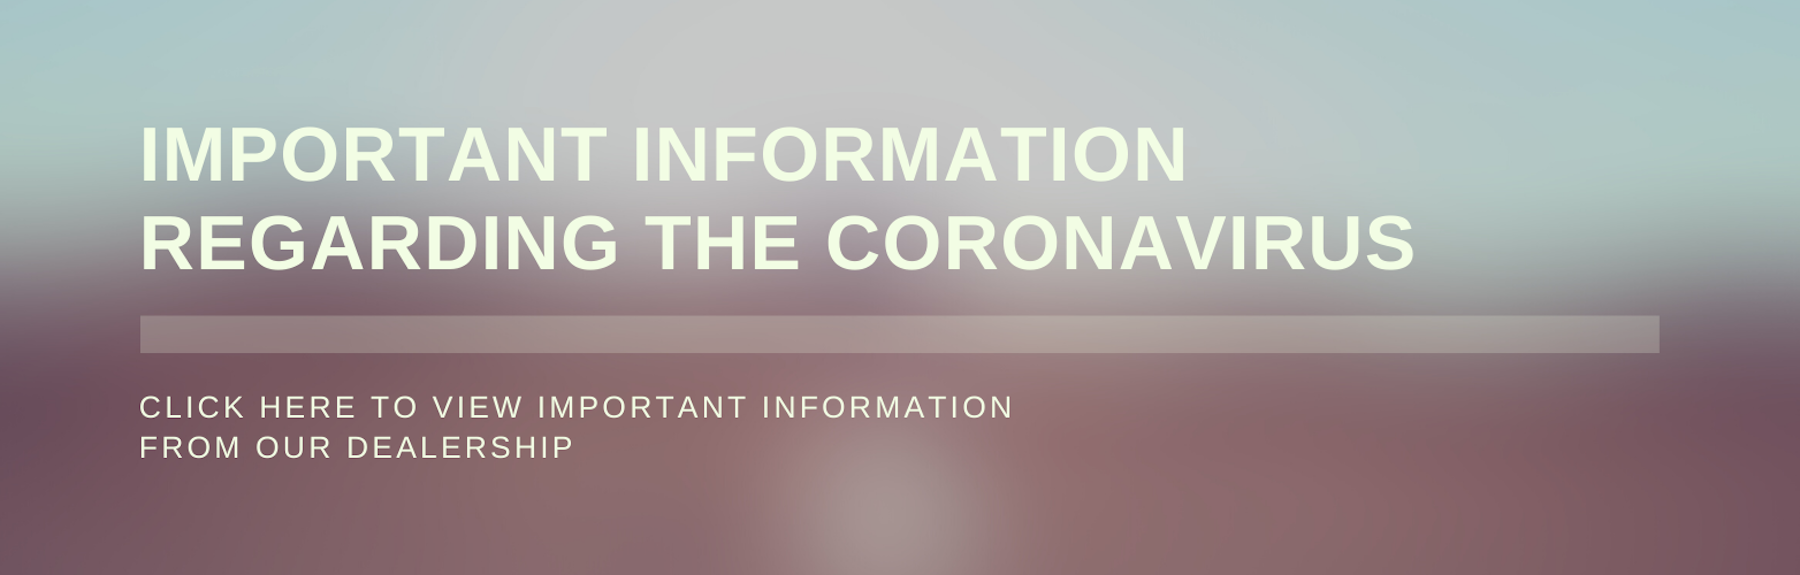 Important Information Regarding CoronaVirus